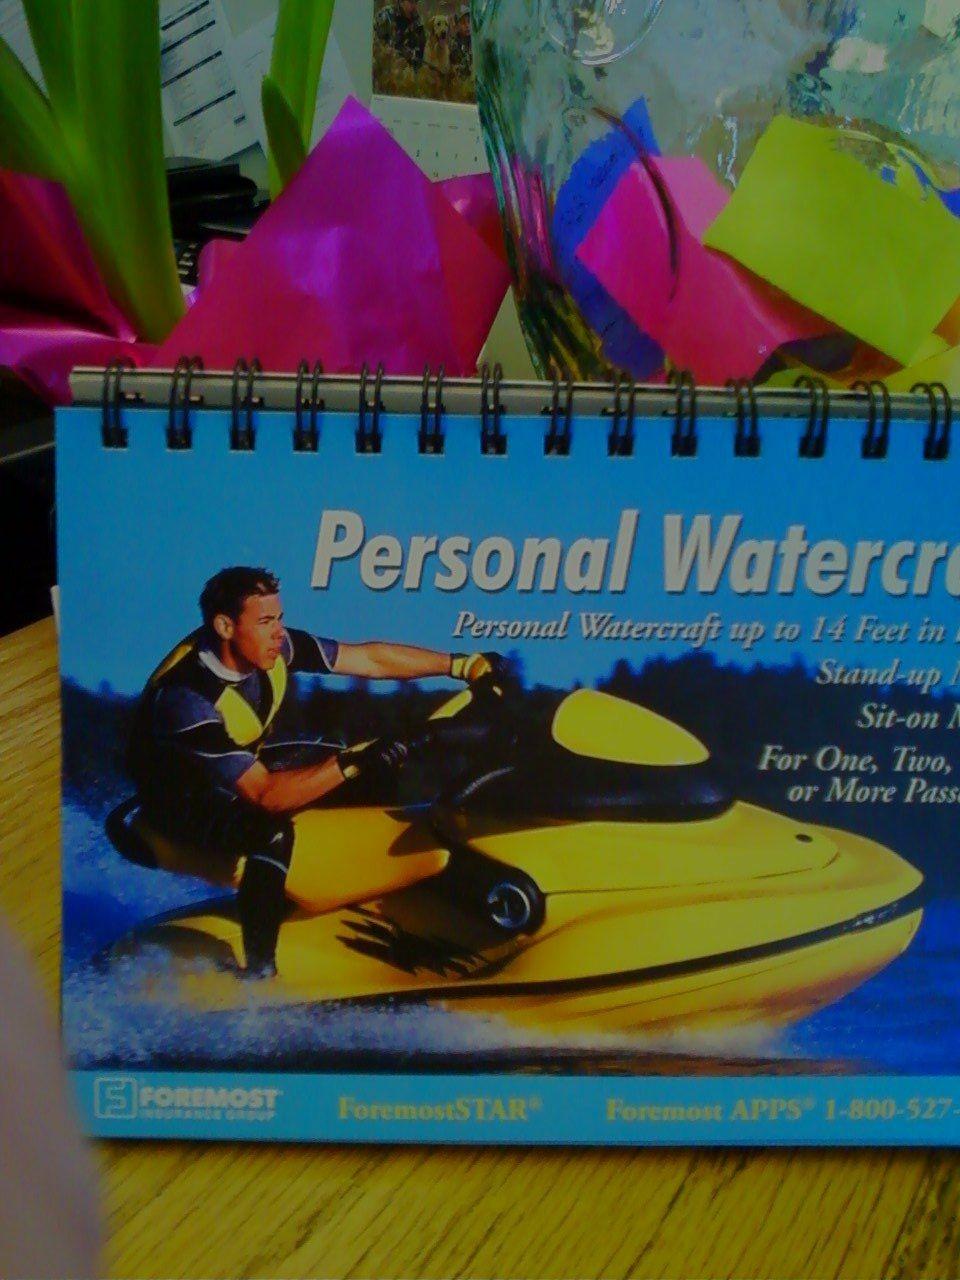 Image by Steve Donigan on Boat Insurance Boat insurance